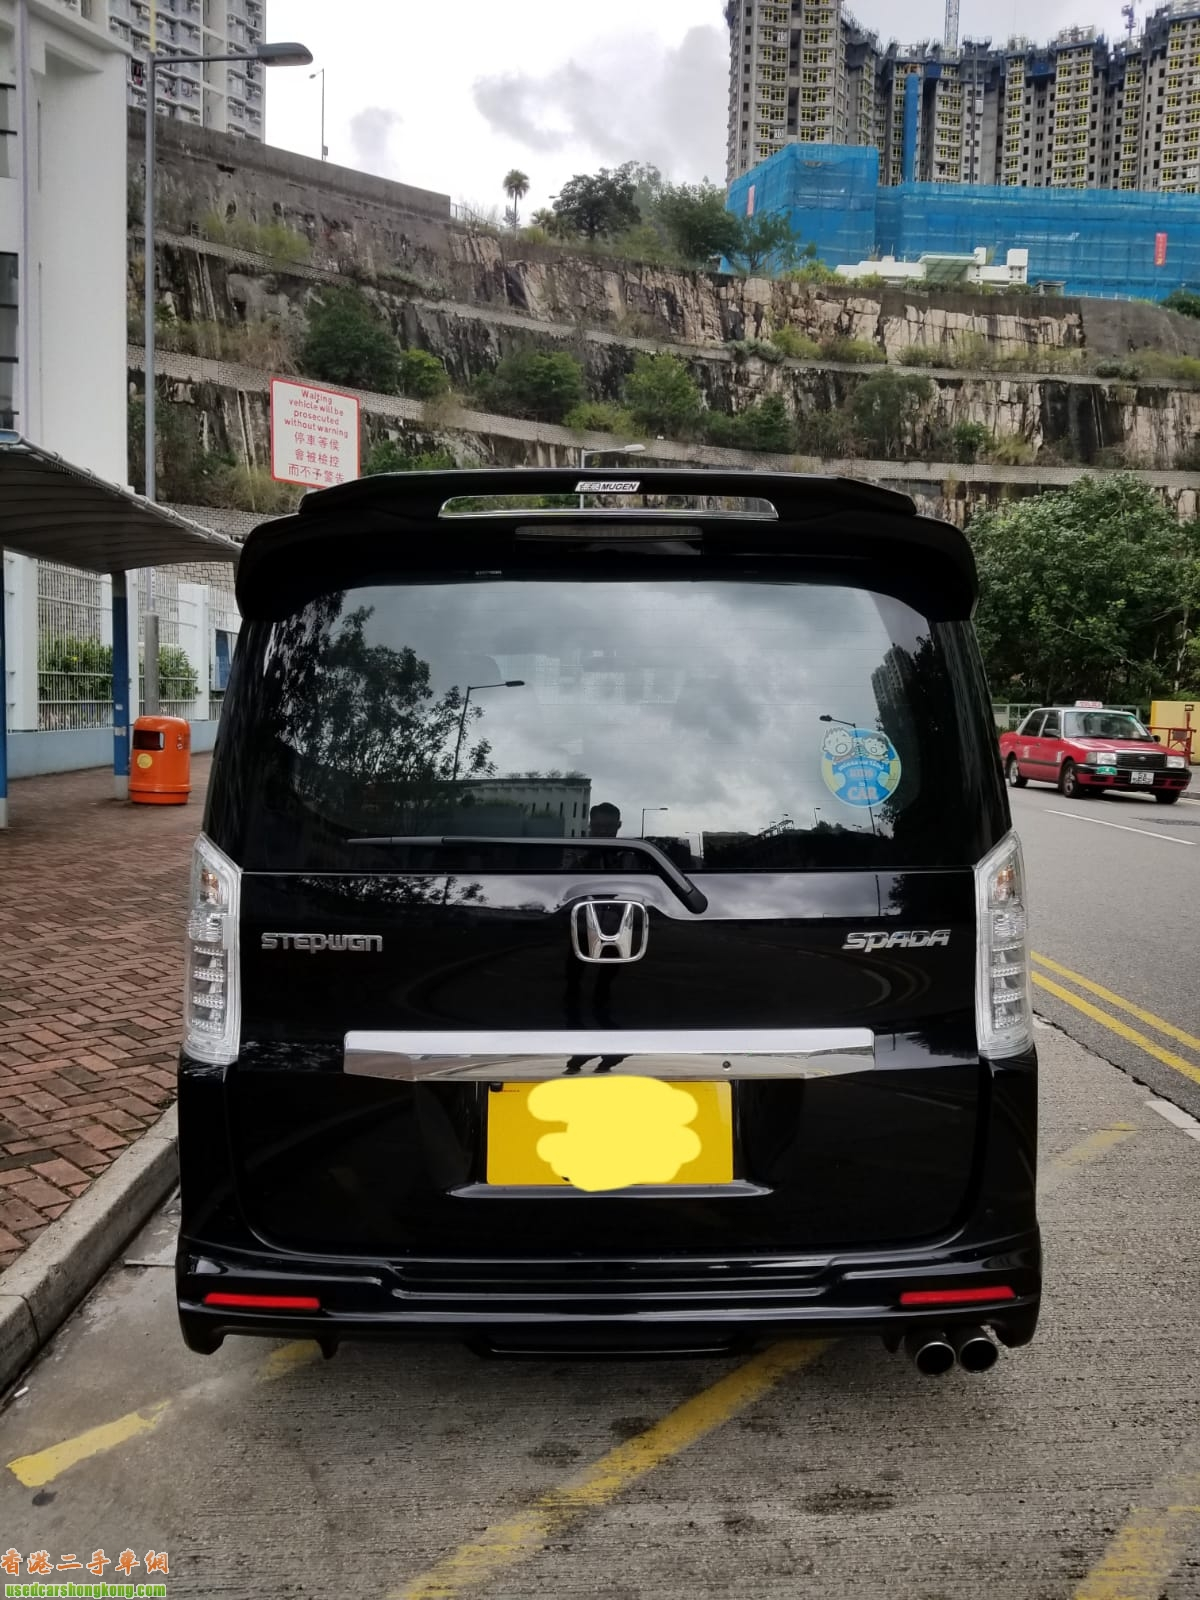 2013 Honda Stepwgn Spada 二手車出售 香港 Honda Stepwgn 二手車易手車 - 香港二手車網